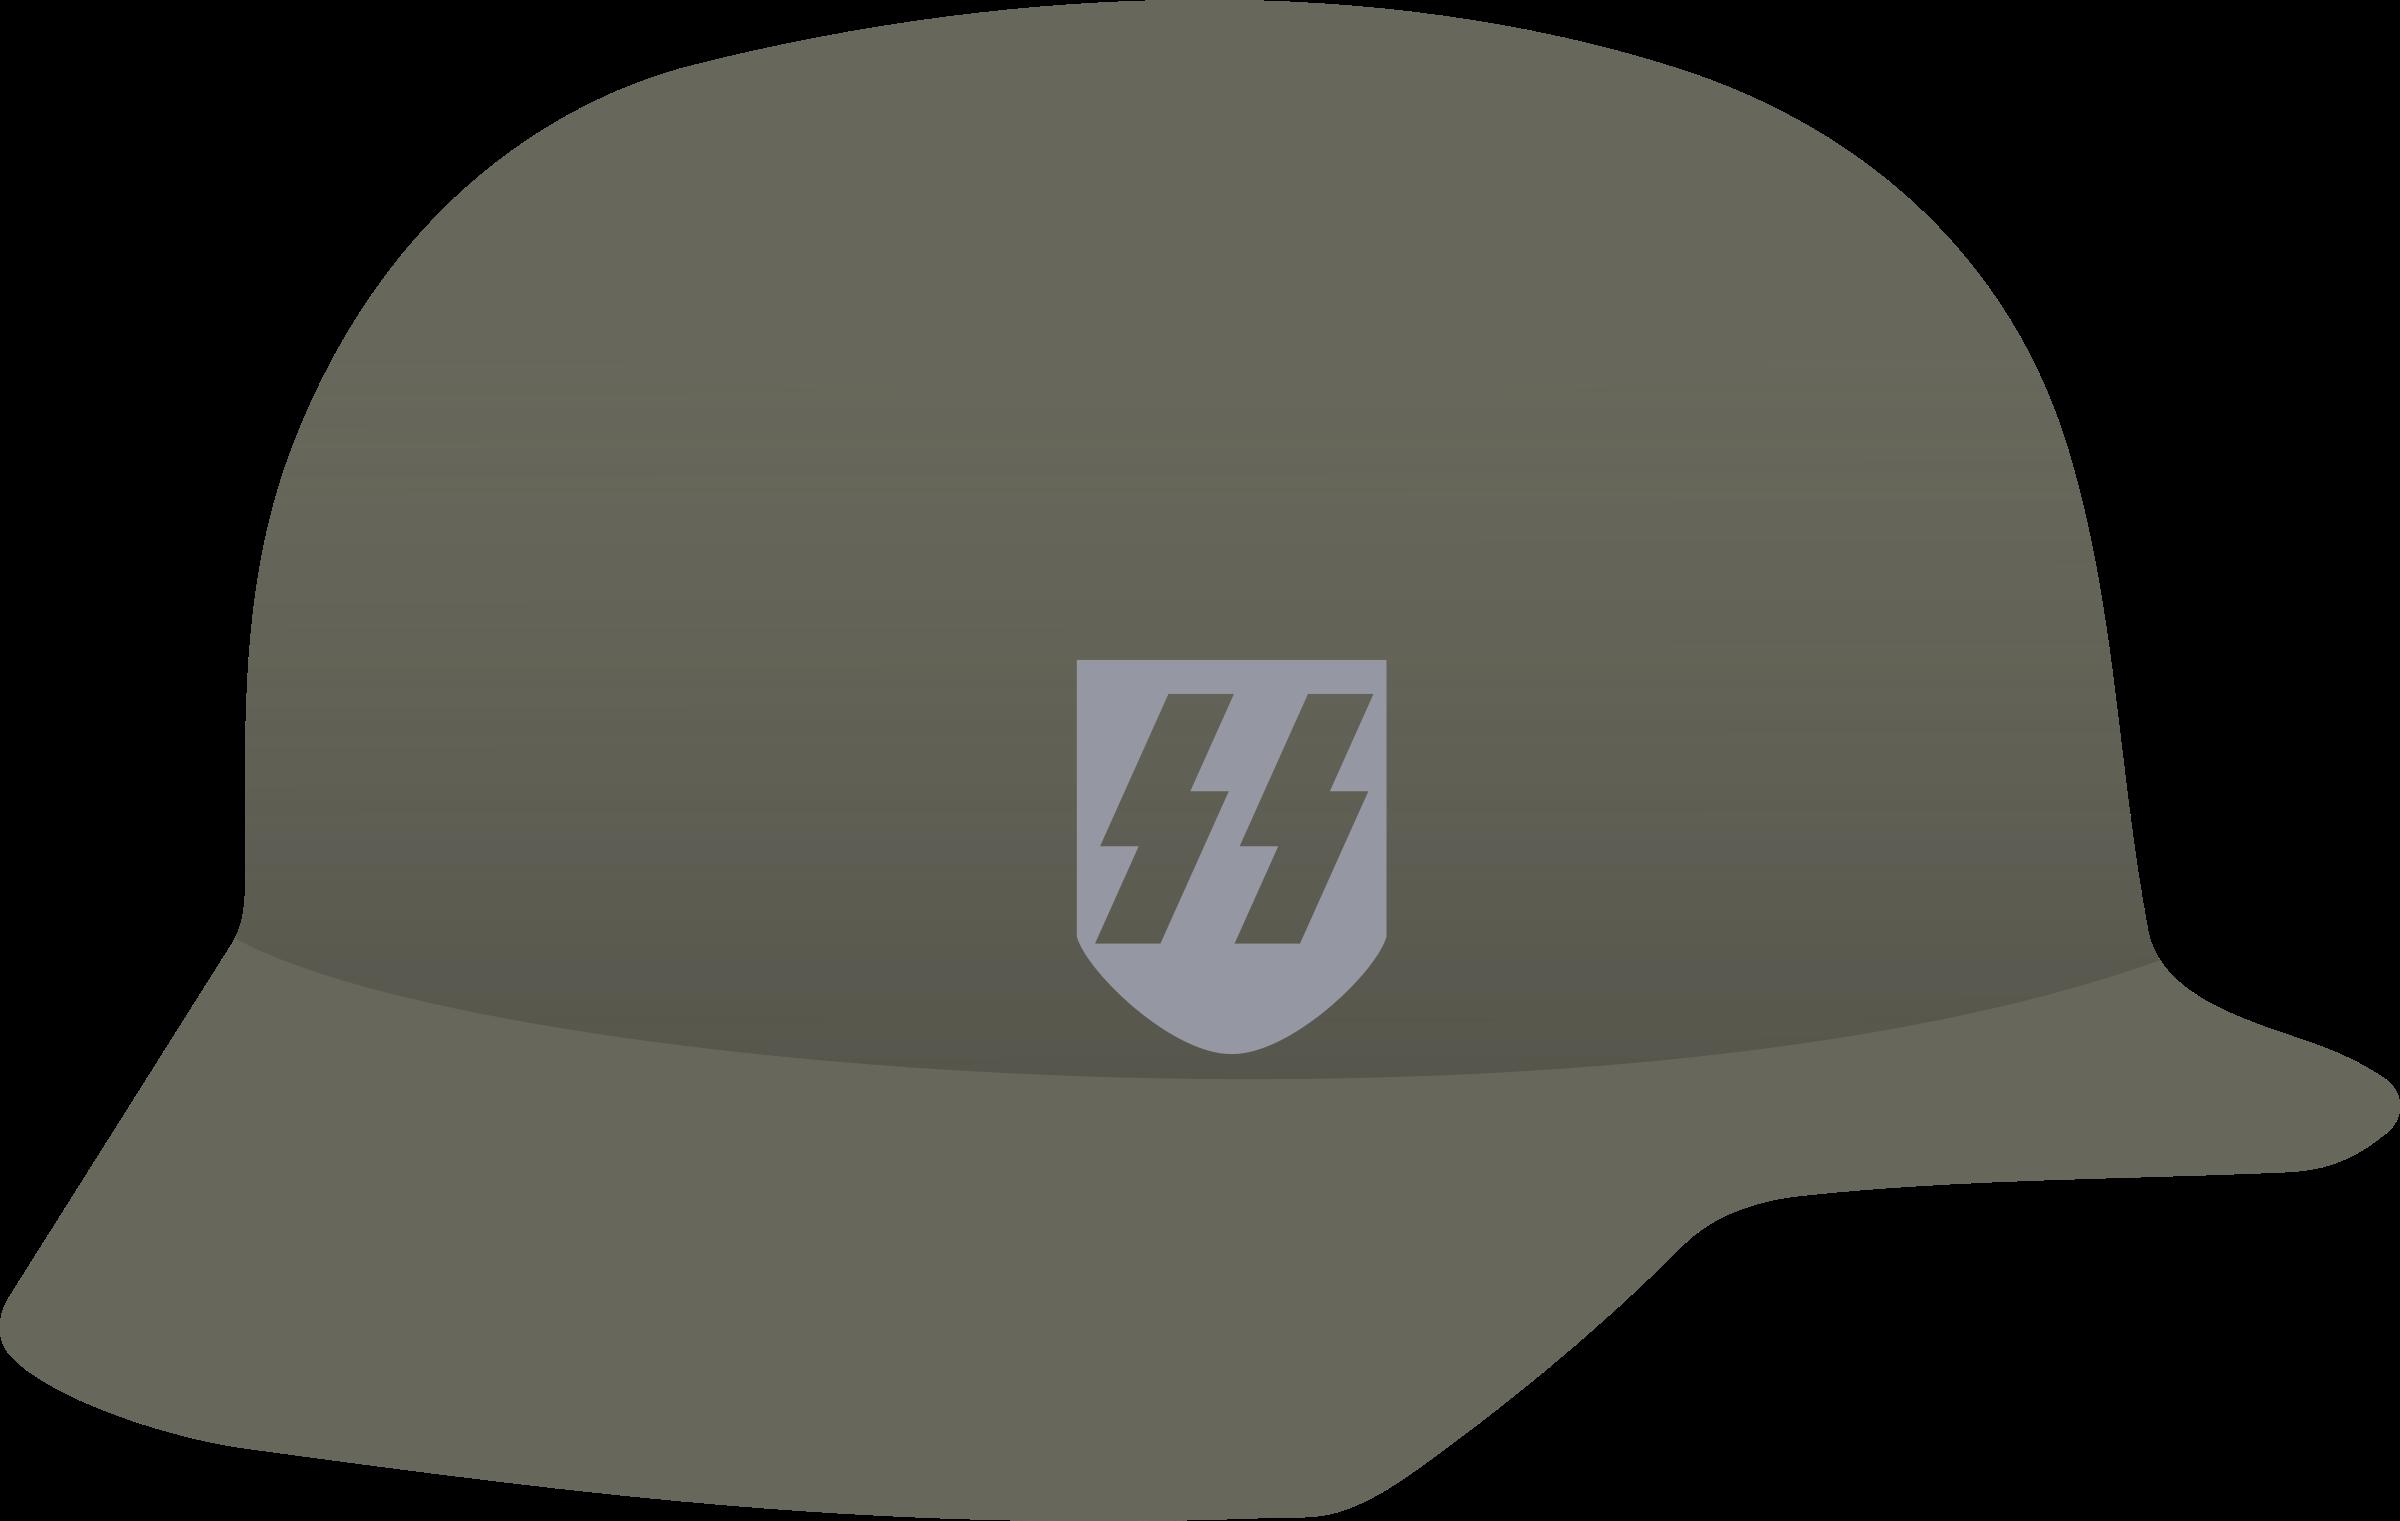 Clipart nazi. Soldier helmet png